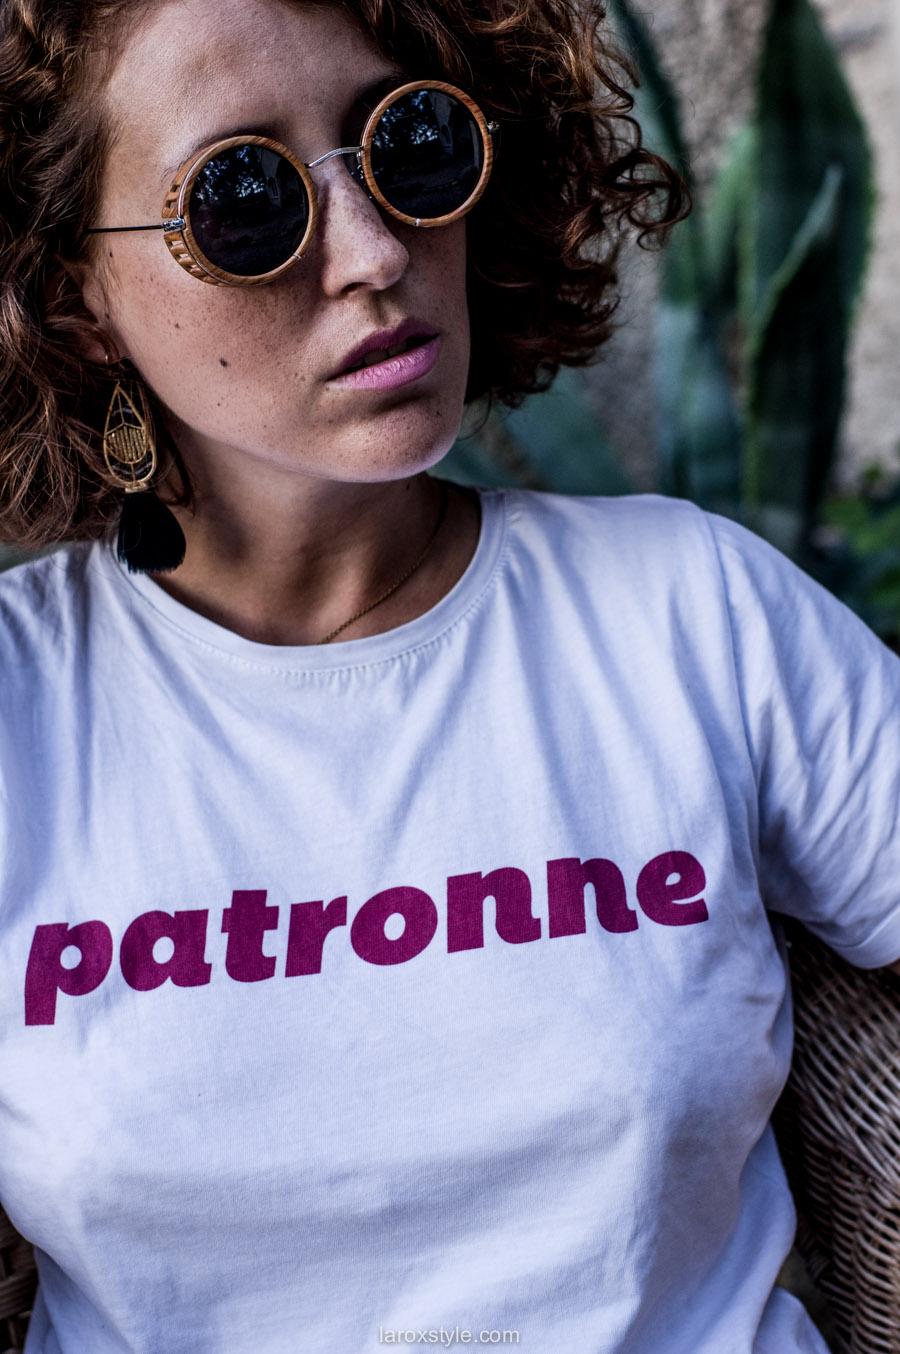 be a boss - girl Boss - patronne - blog mode et lifestyle lyon-12